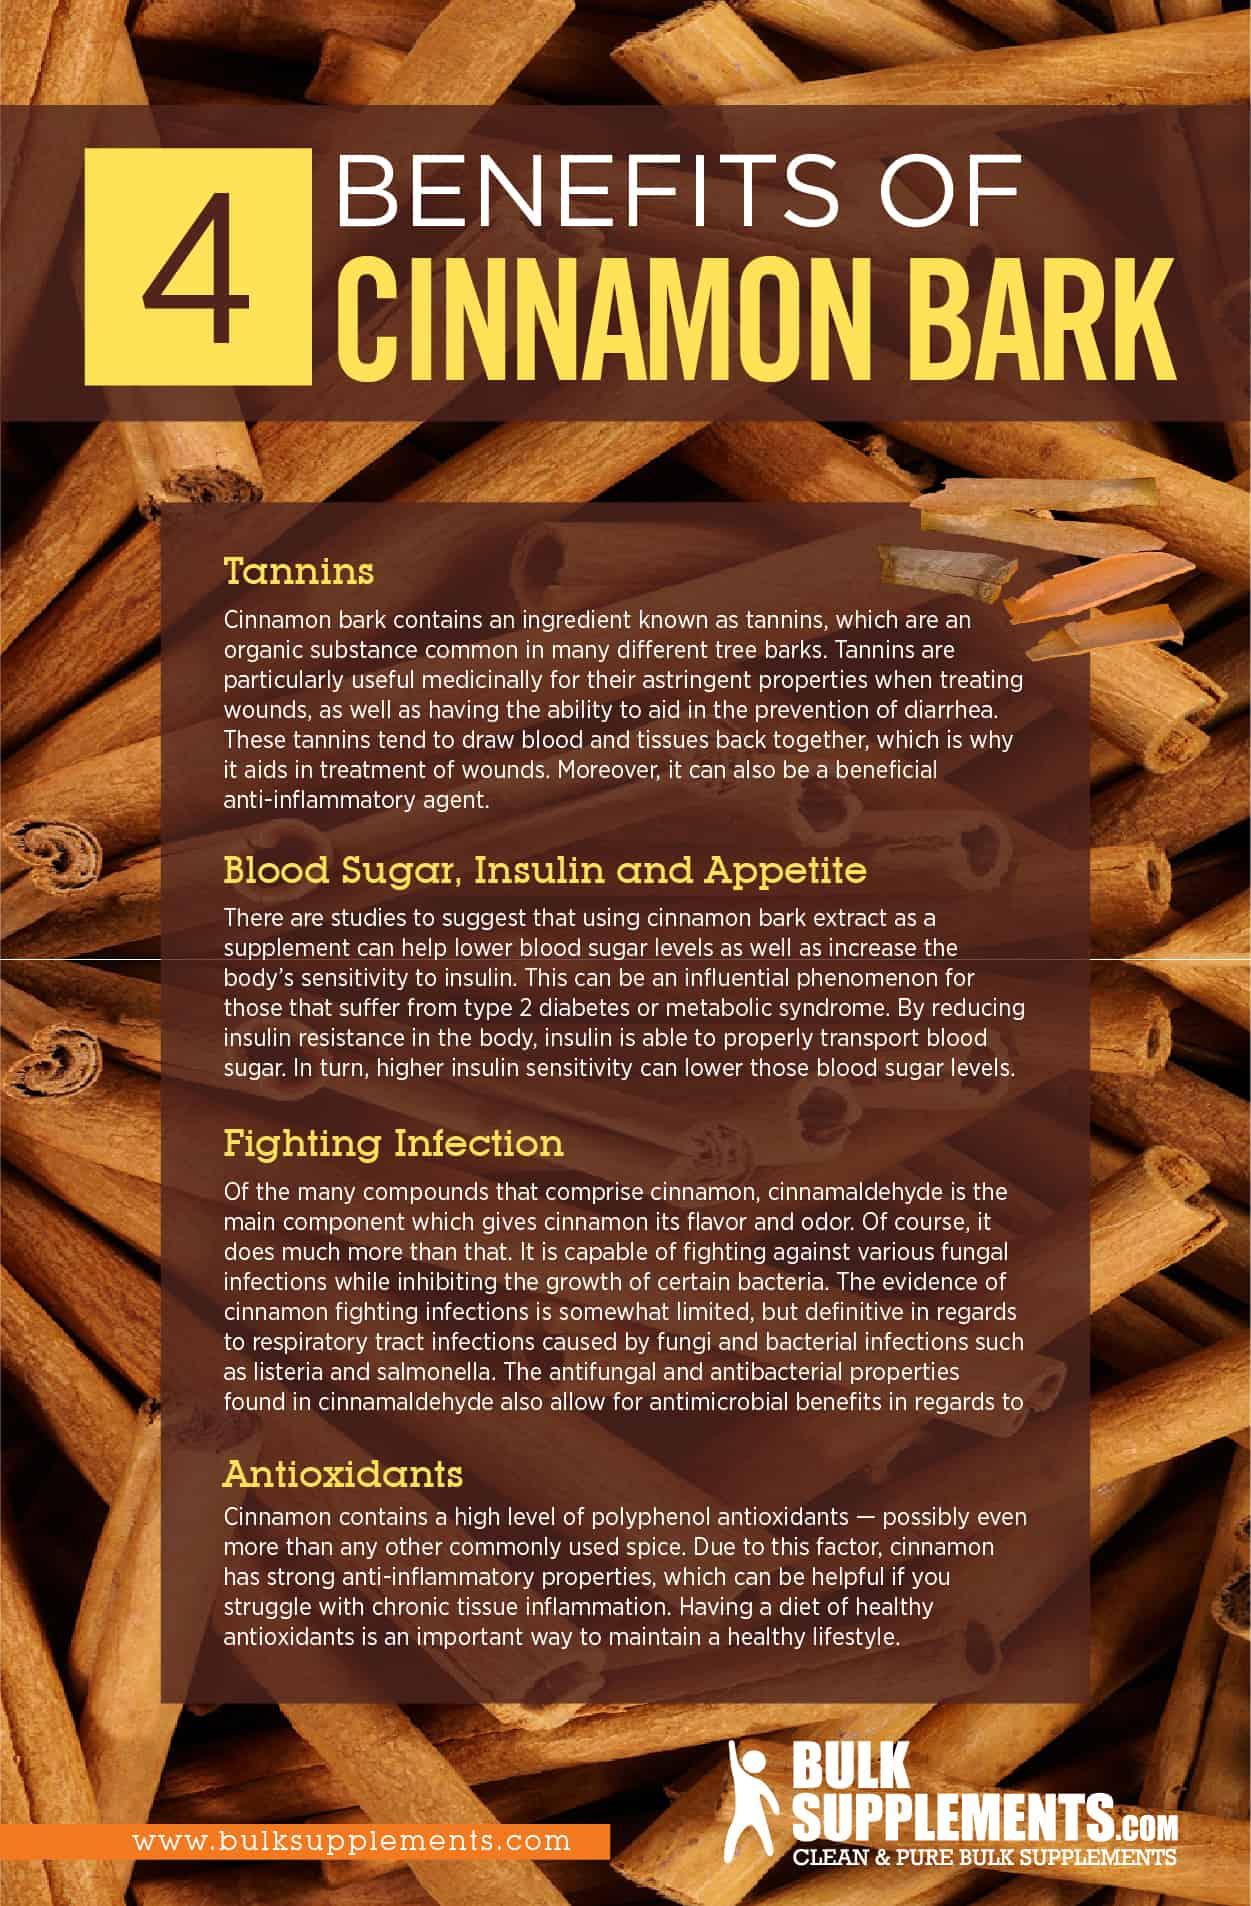 cinnamon bark benefits